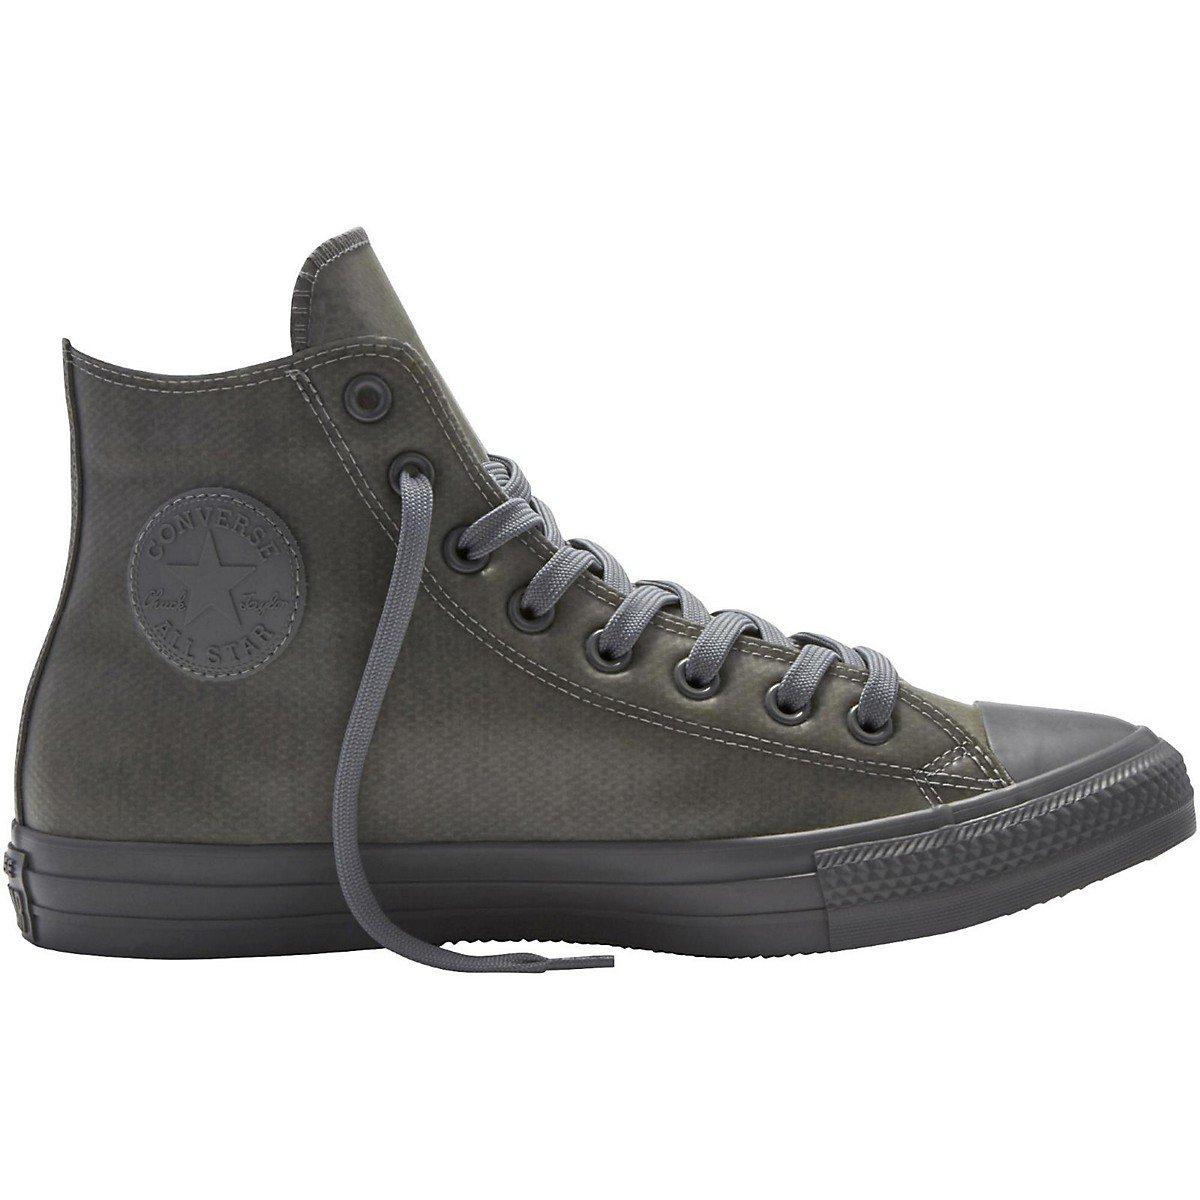 Converse Leather All Star  Unisex   Erwachsene Sneaker Mason/ Mason/ Mason